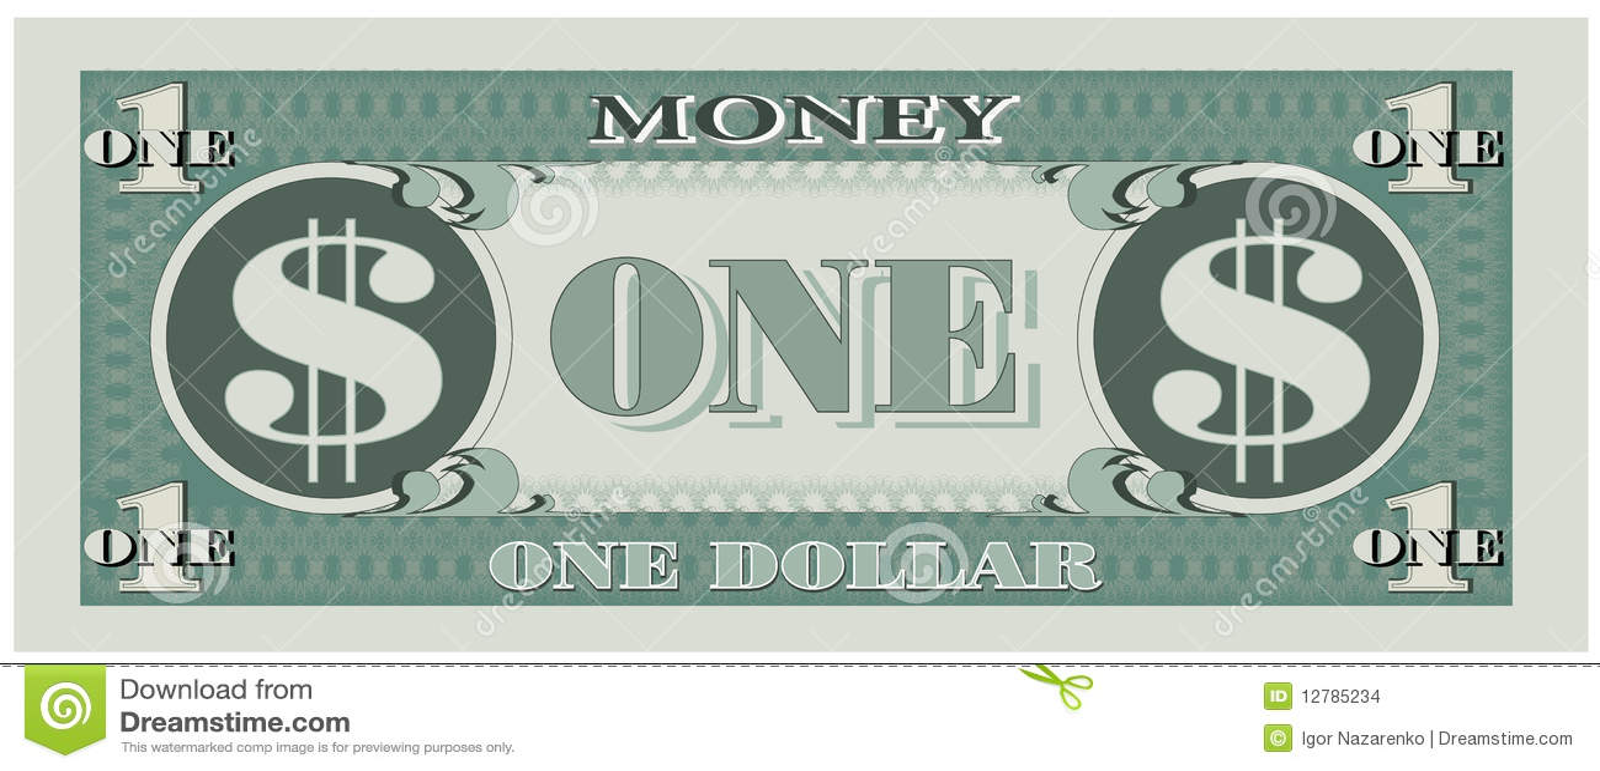 game money - one dollar bill stock vector